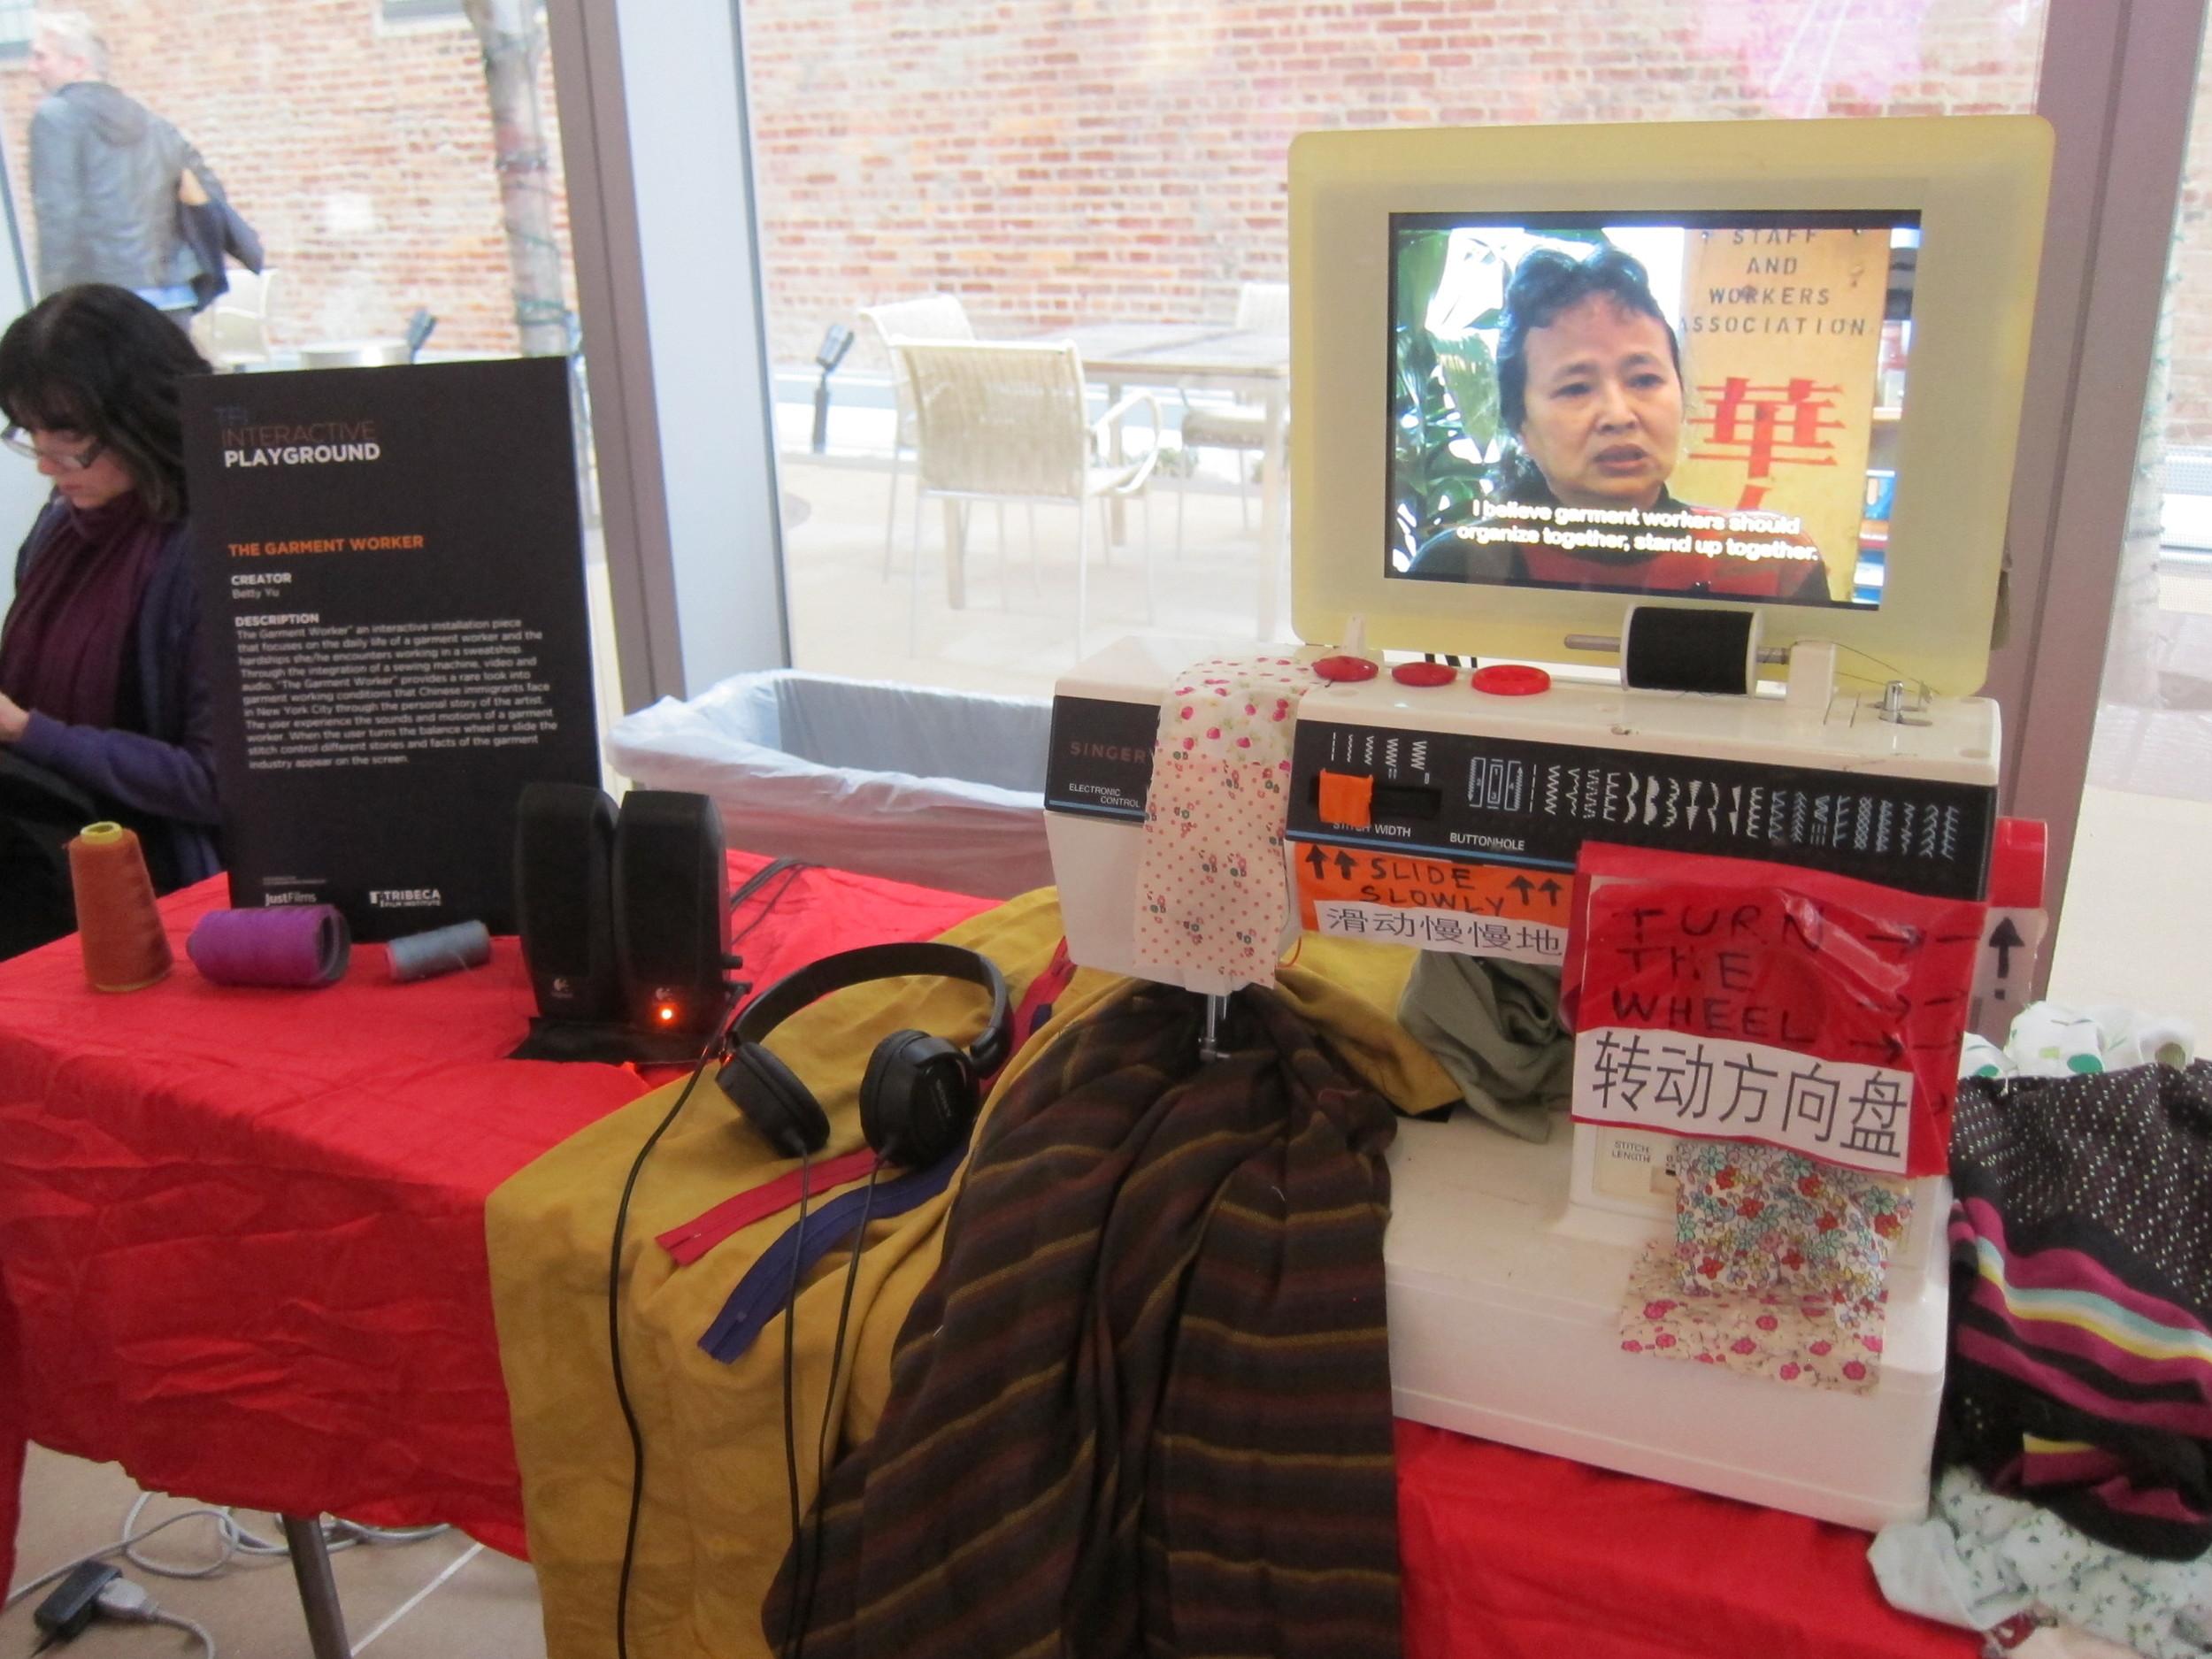 Tribeca Institute's Interactive iPlayground Showcase, 2014